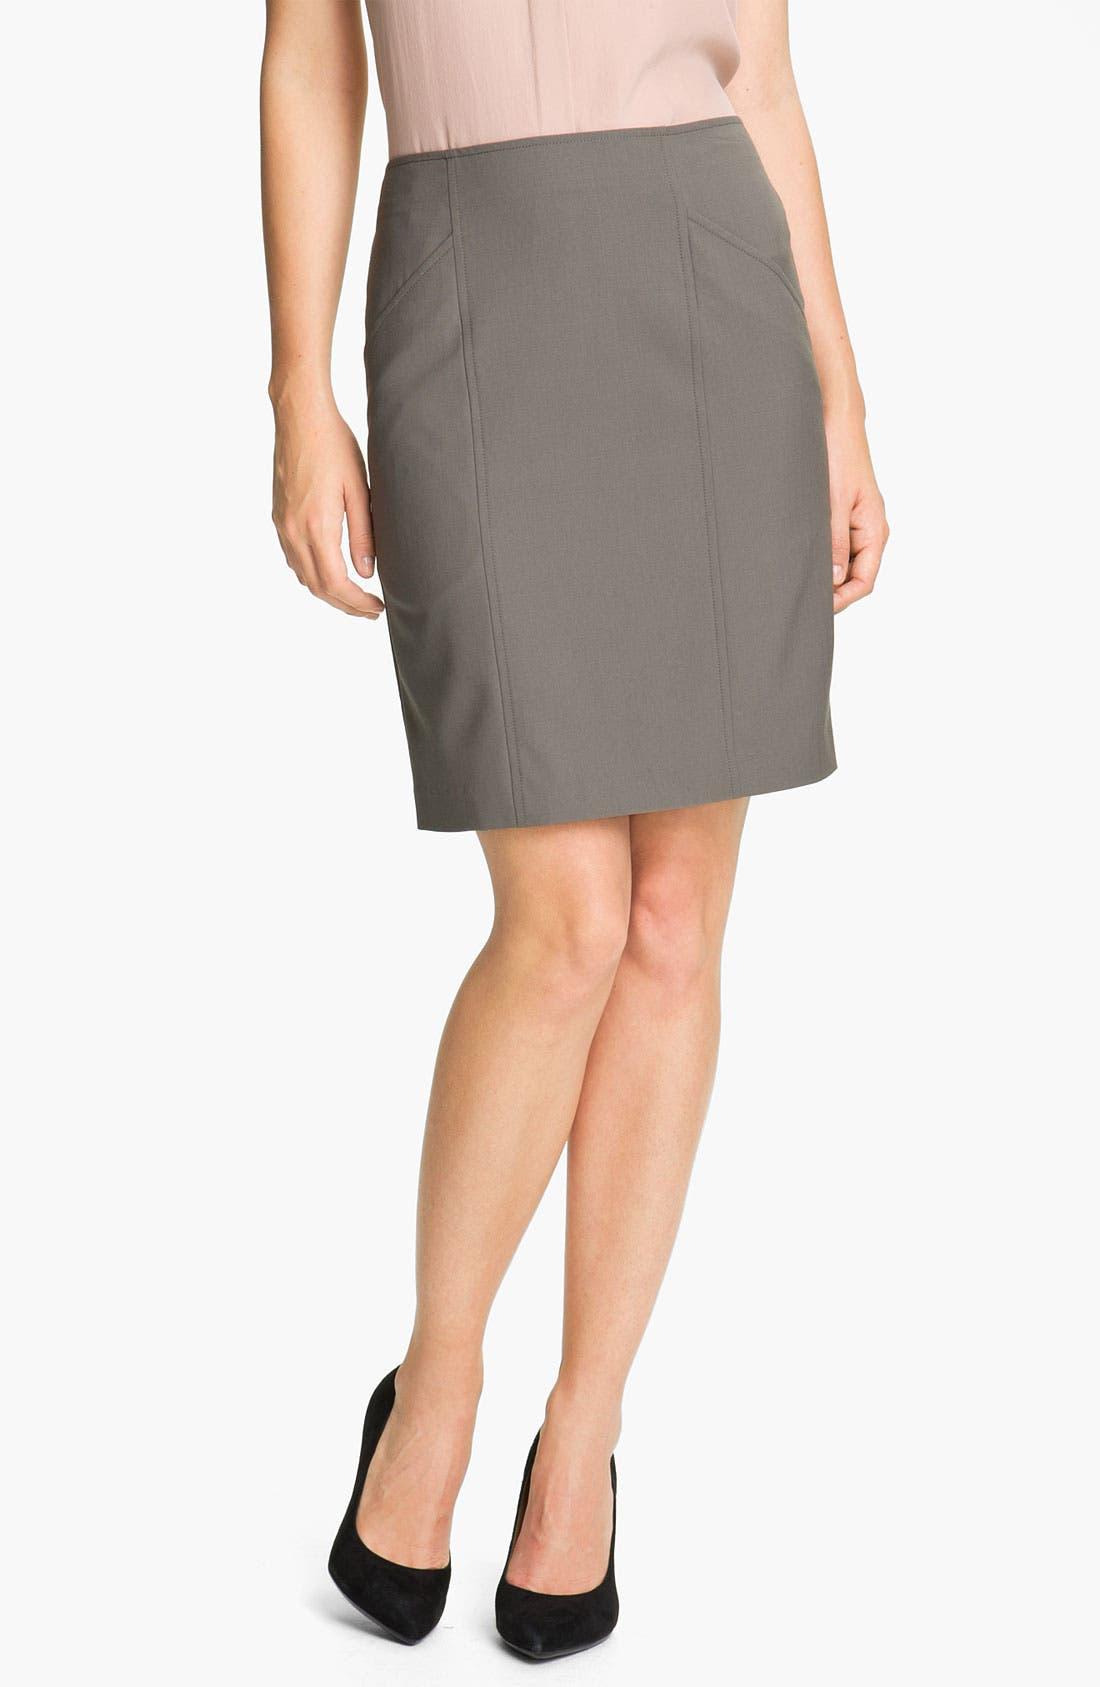 Alternate Image 1 Selected - Theory 'Nuria - Tailor' Pencil Skirt